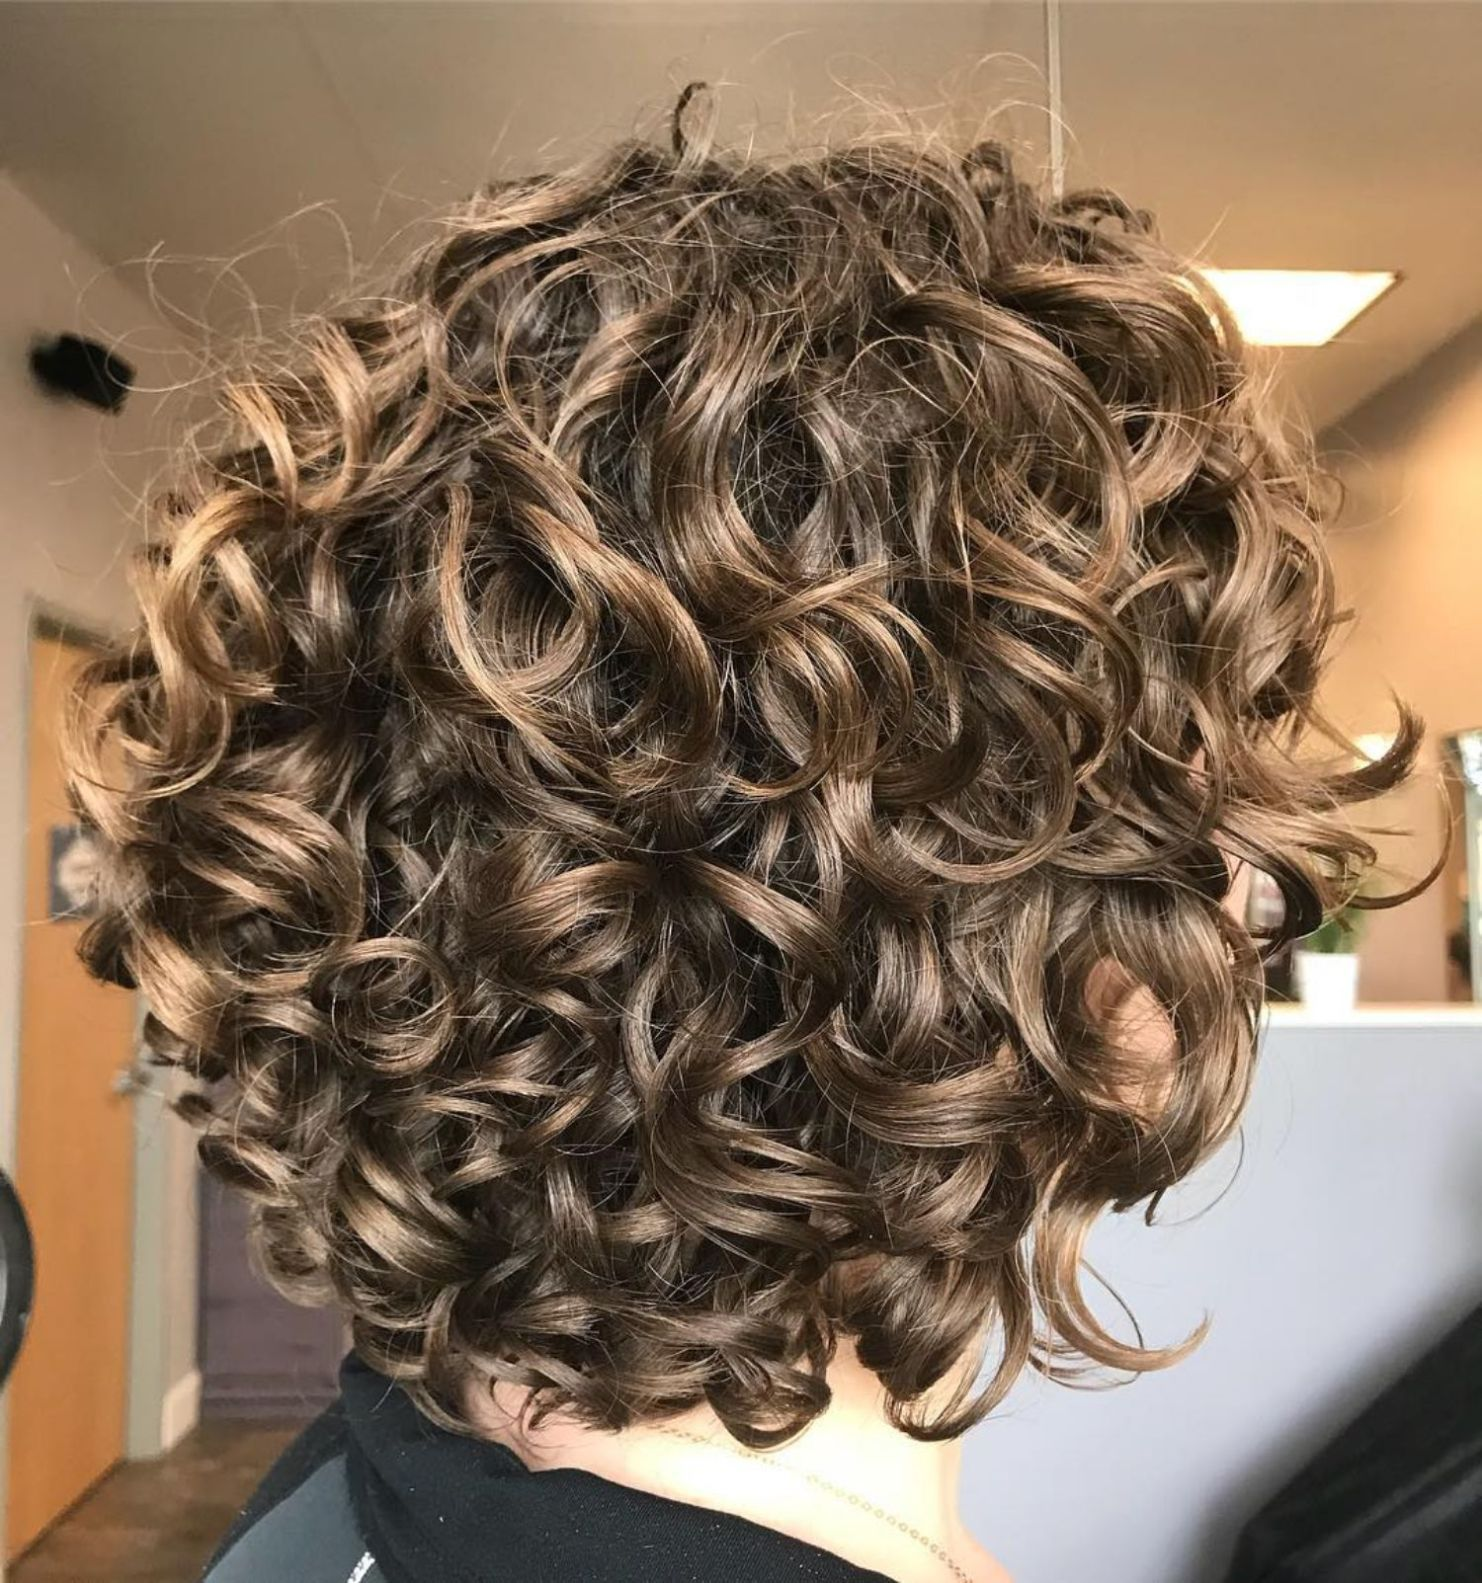 Épinglé par Maryline Ac sur Curly hair styles en 2020